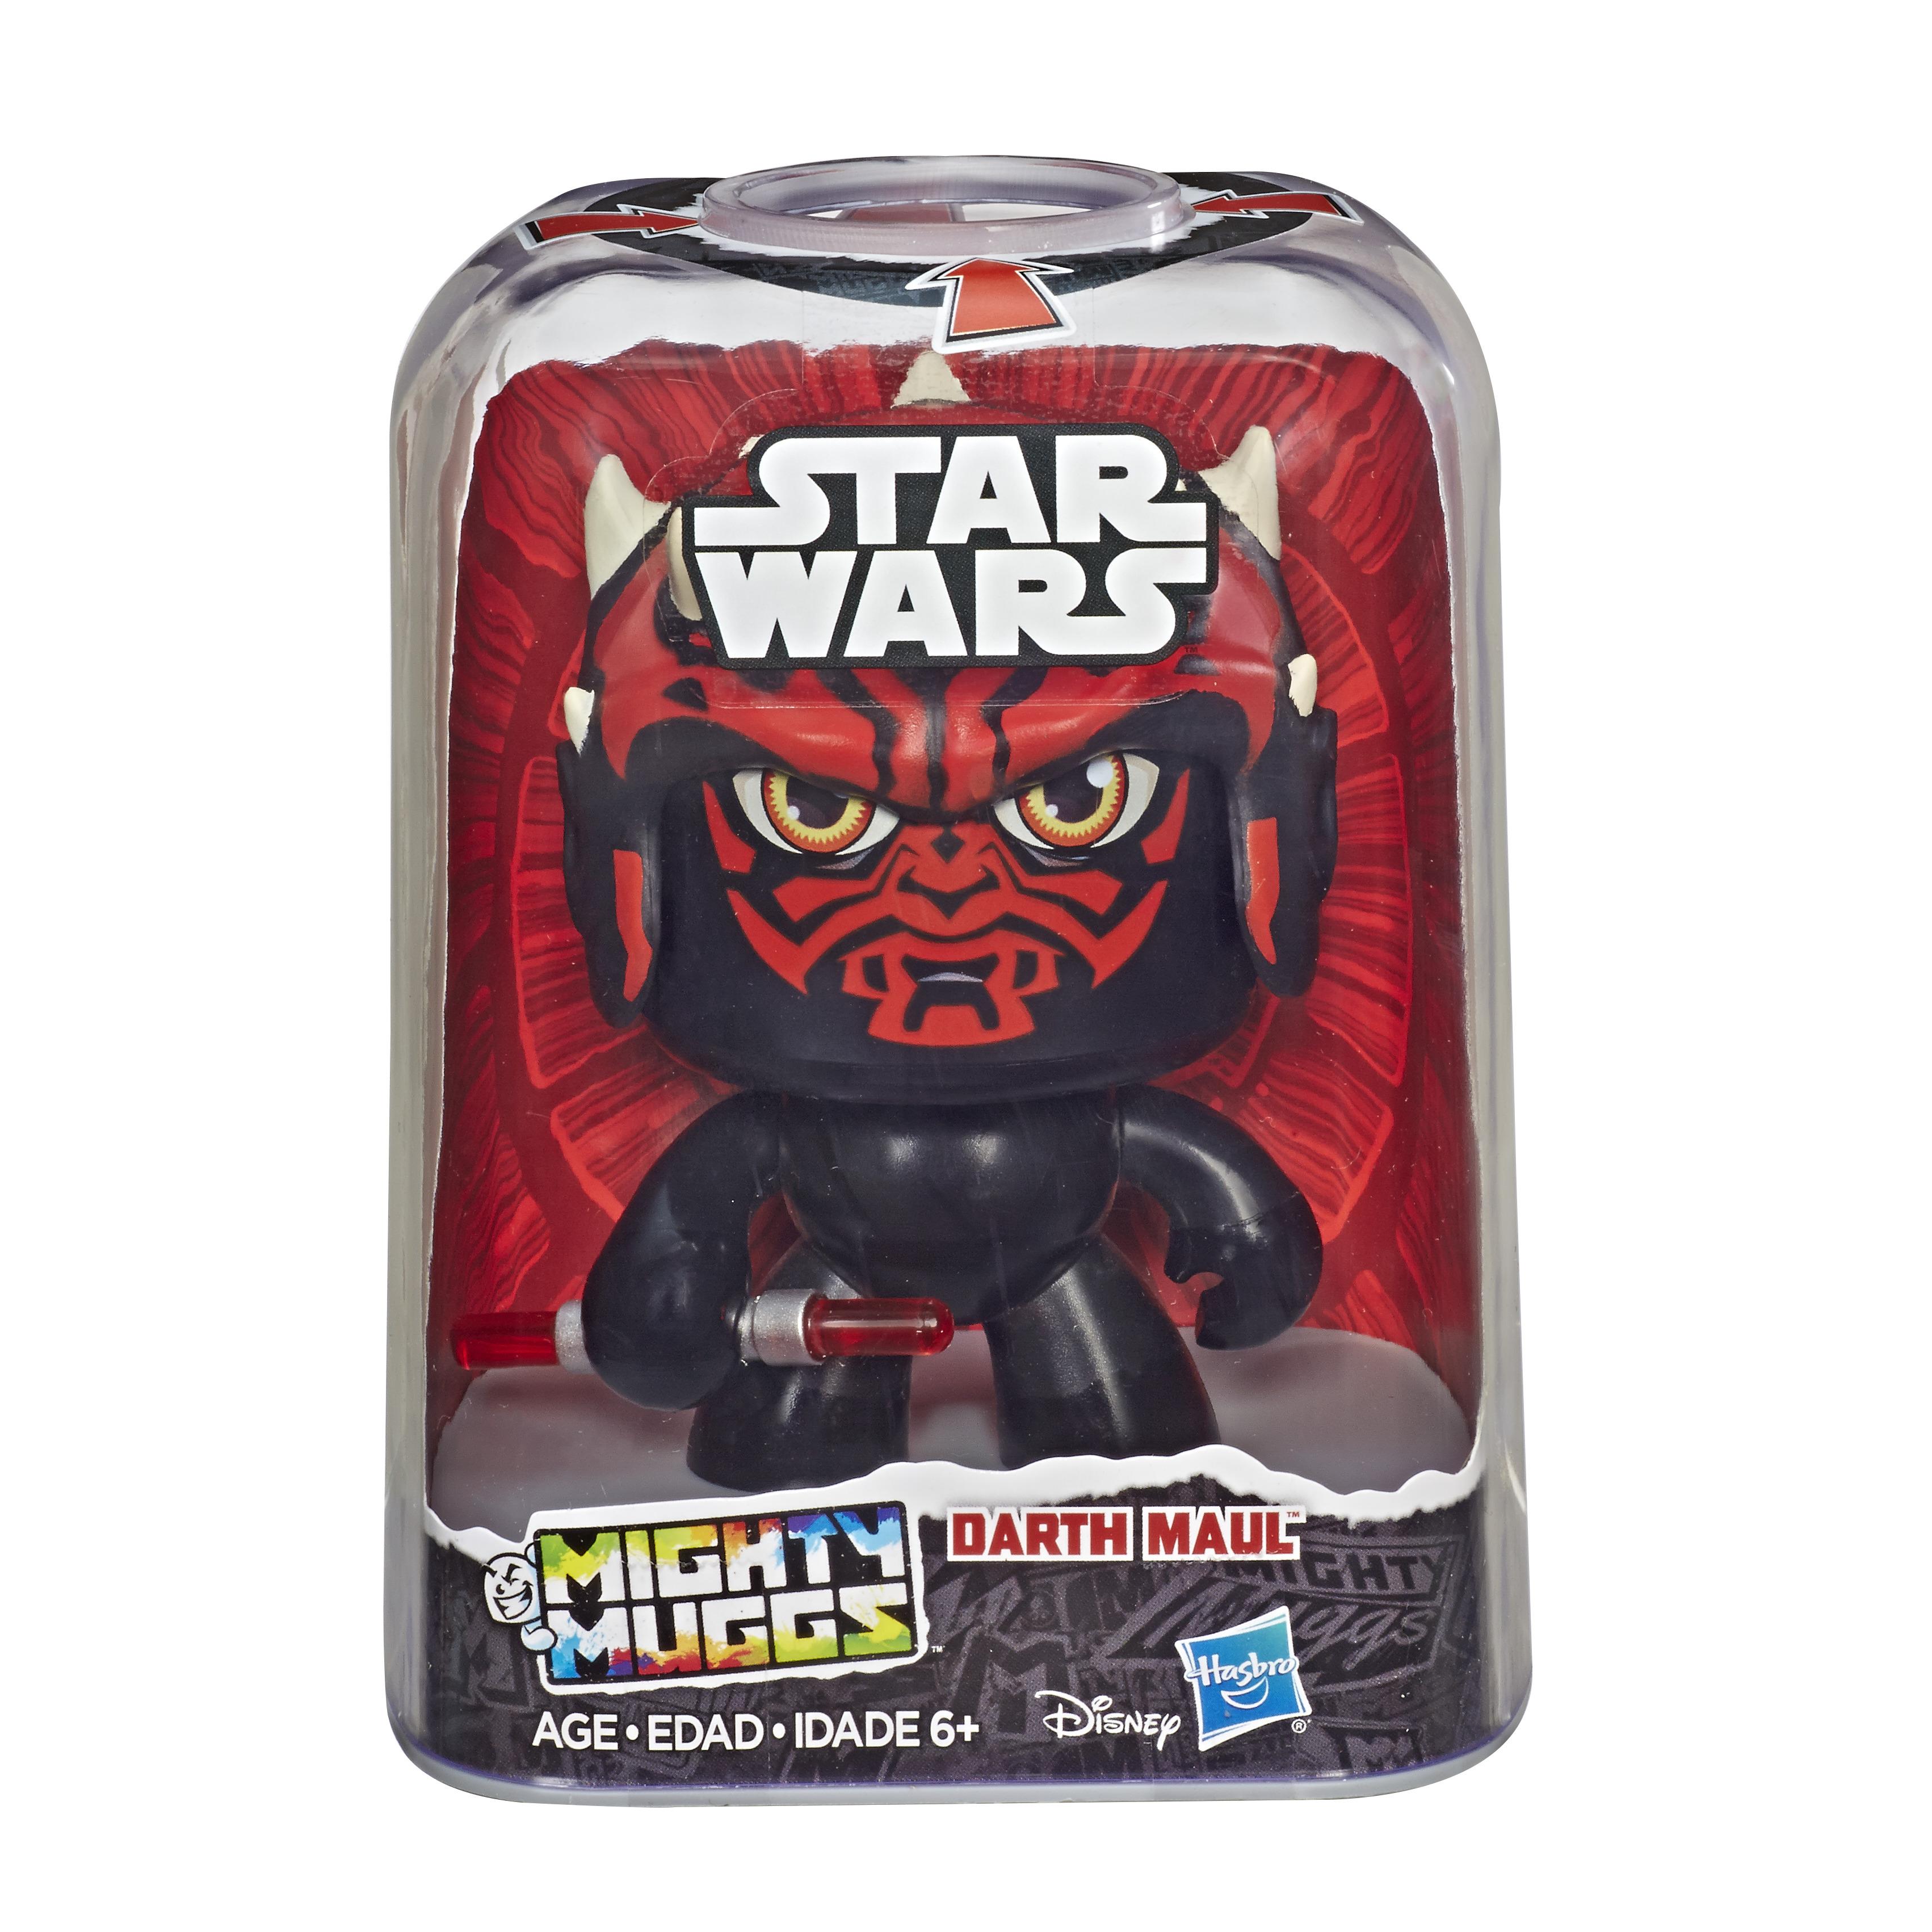 Mighty Muggs. Star Wars - Darth Maul